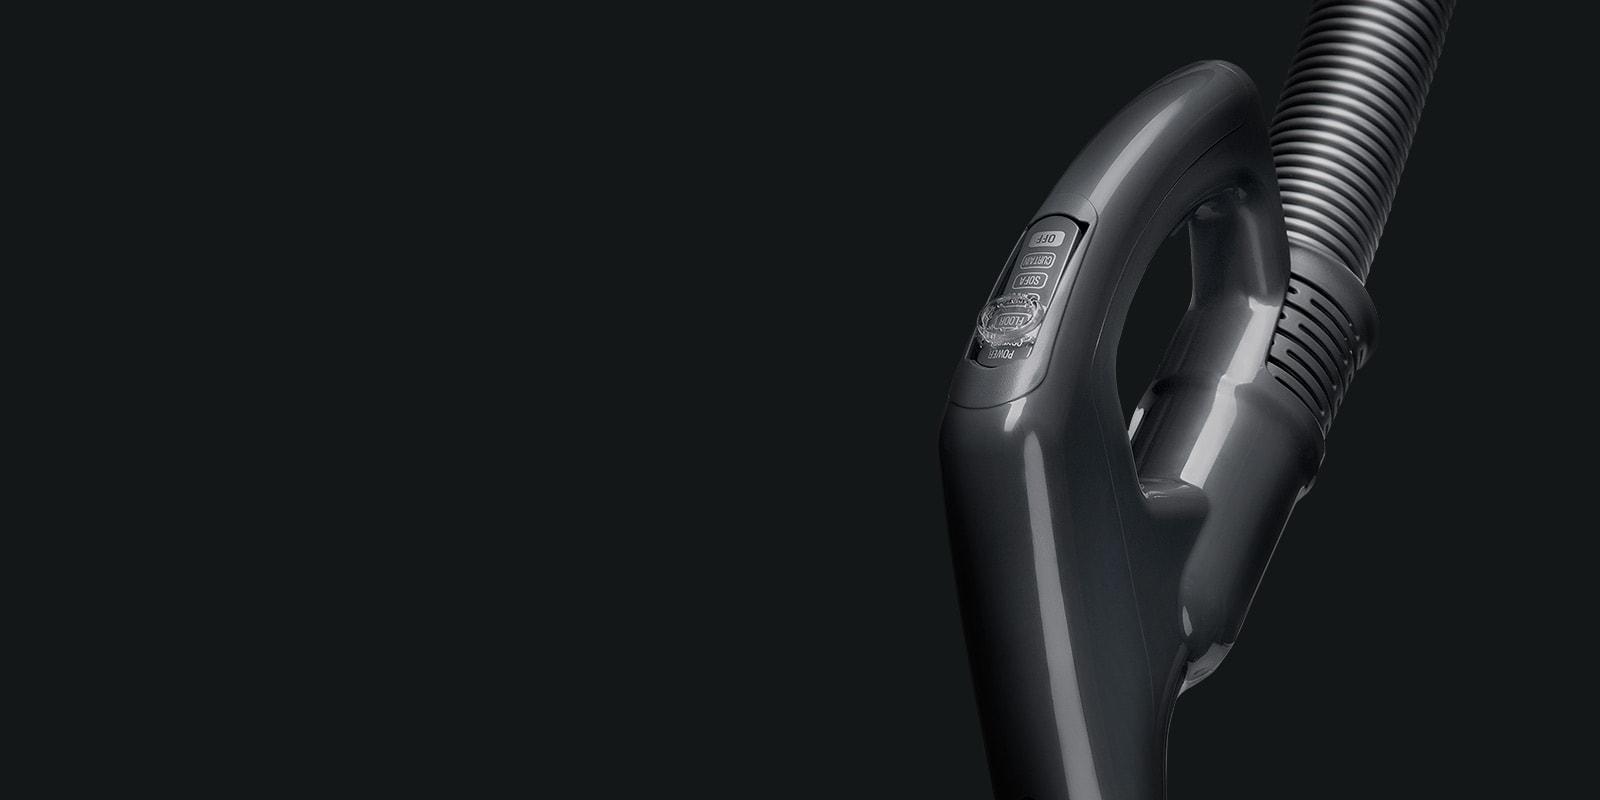 lg_kompressor_1200-contoller-handle-bg